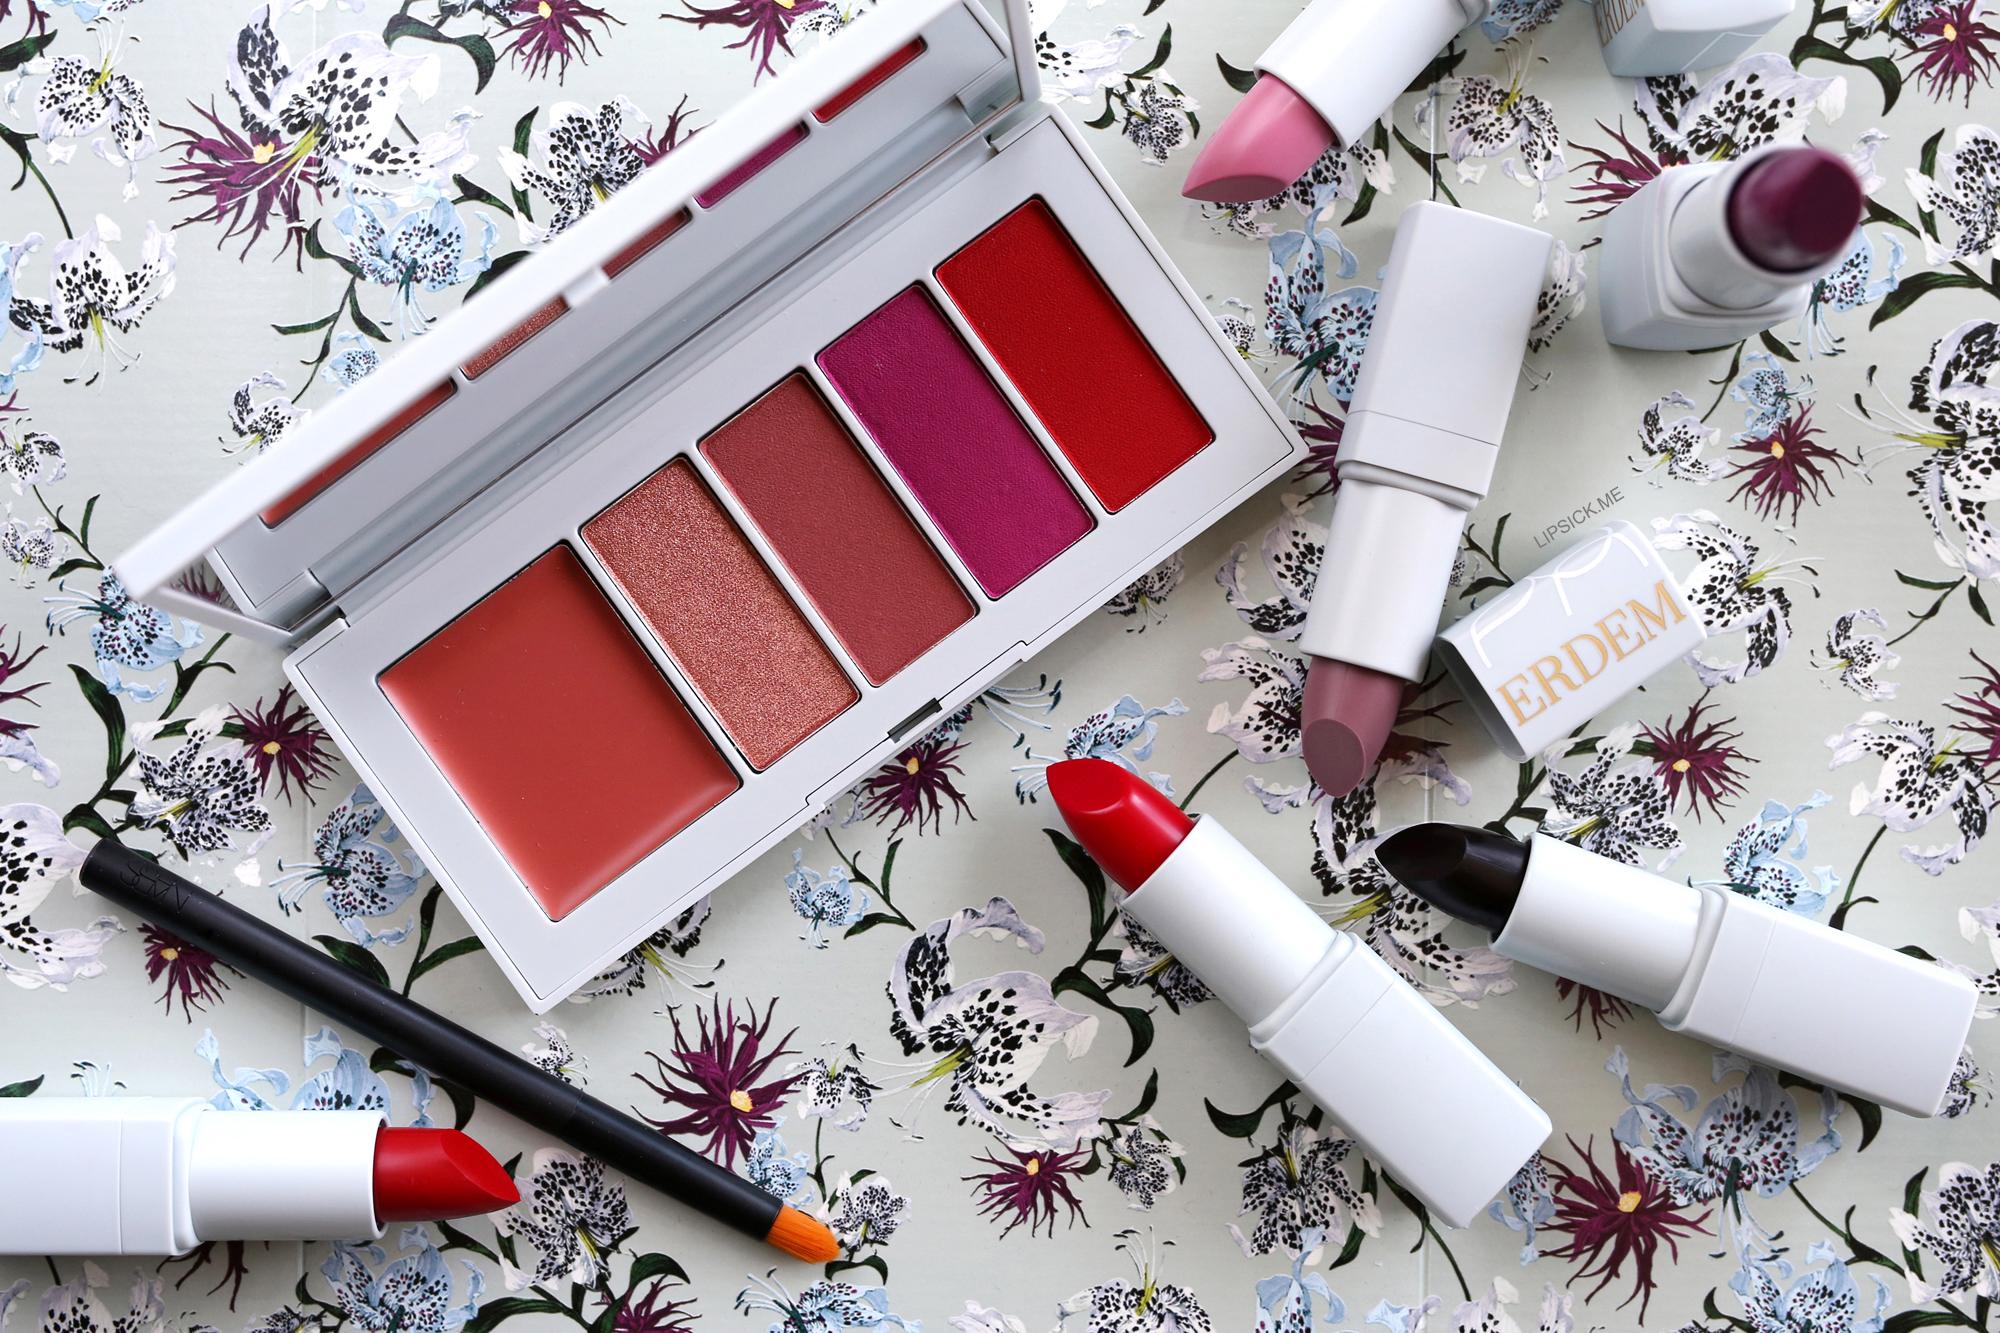 NARS x Erdem Full Lipstick Collection - Carnal Carnation, Bloodflower, Wild Flower, Moon Orchid, Larkspur, Voodoo Lily_0041 copy.jpg